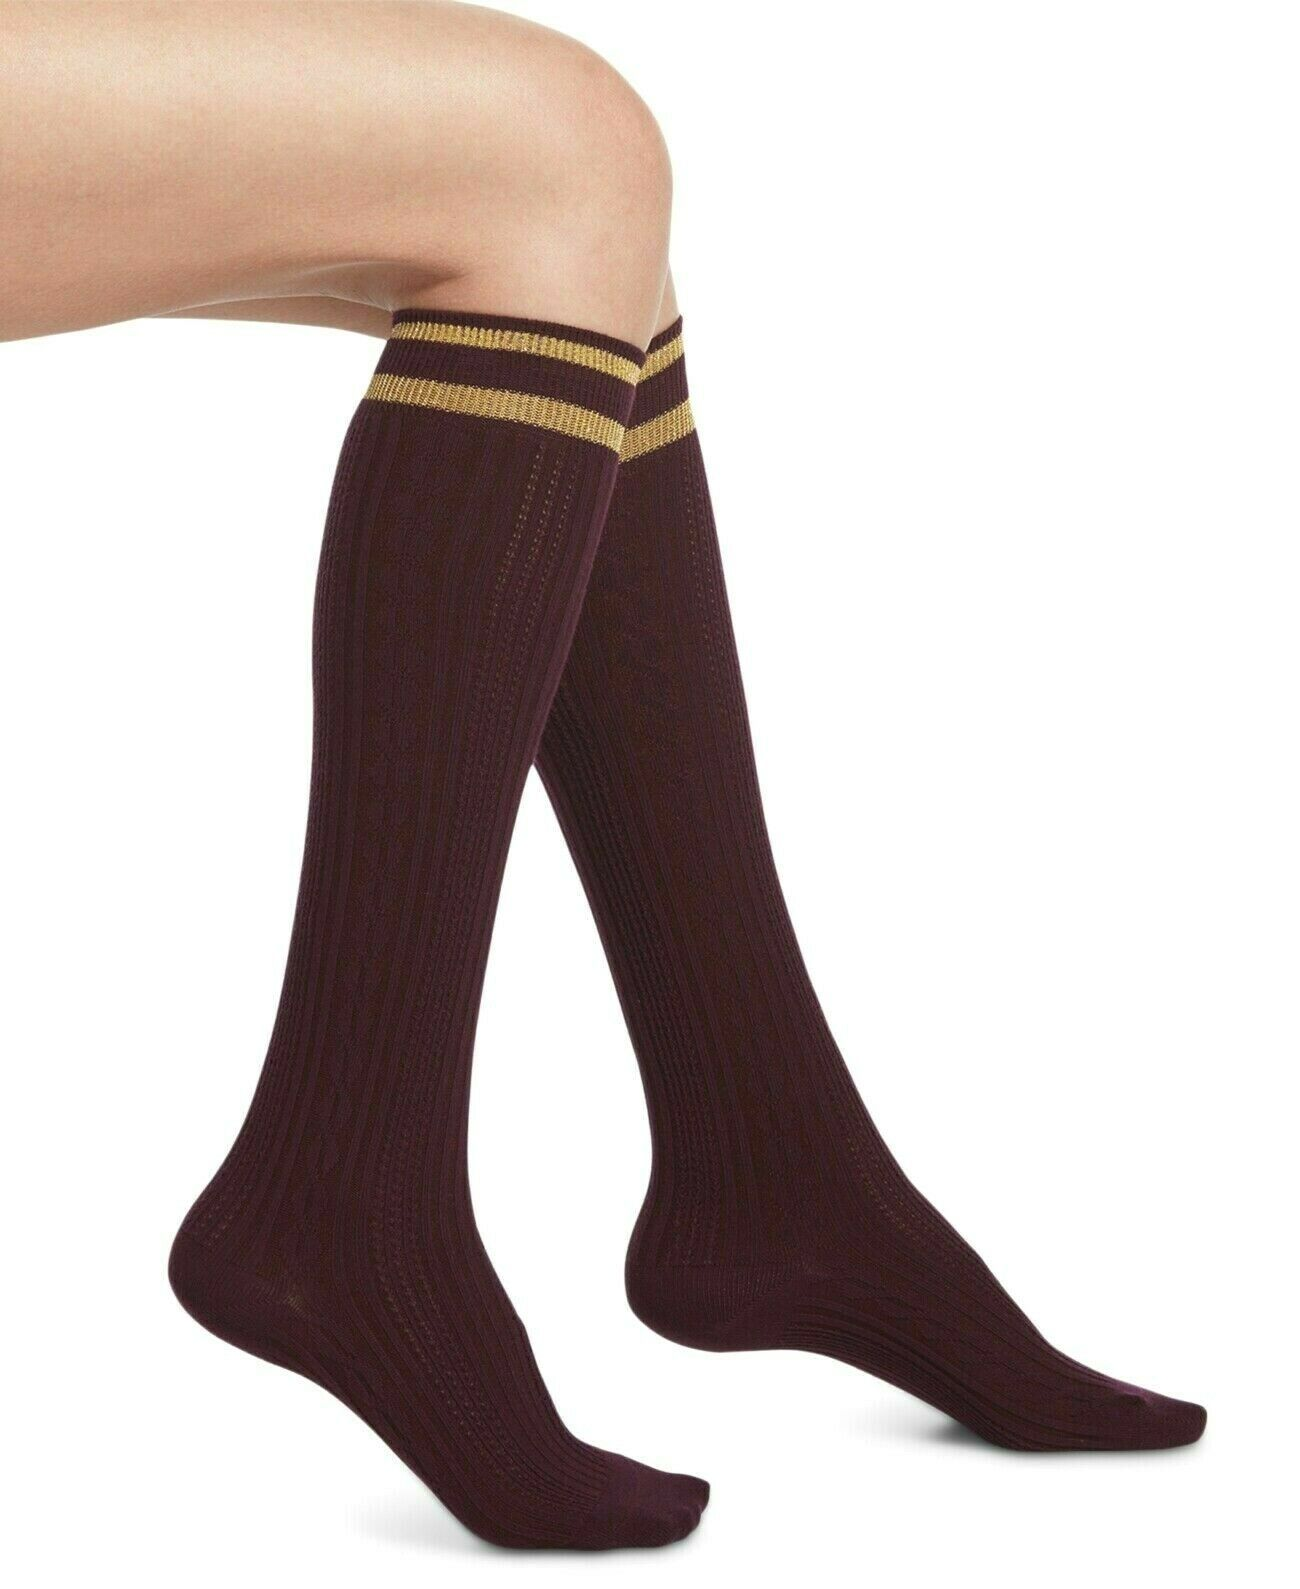 HUE Oro Metálico Rayas Borgoña Intenso Cable-Knit hasta la Rodilla Socks 9-11 De